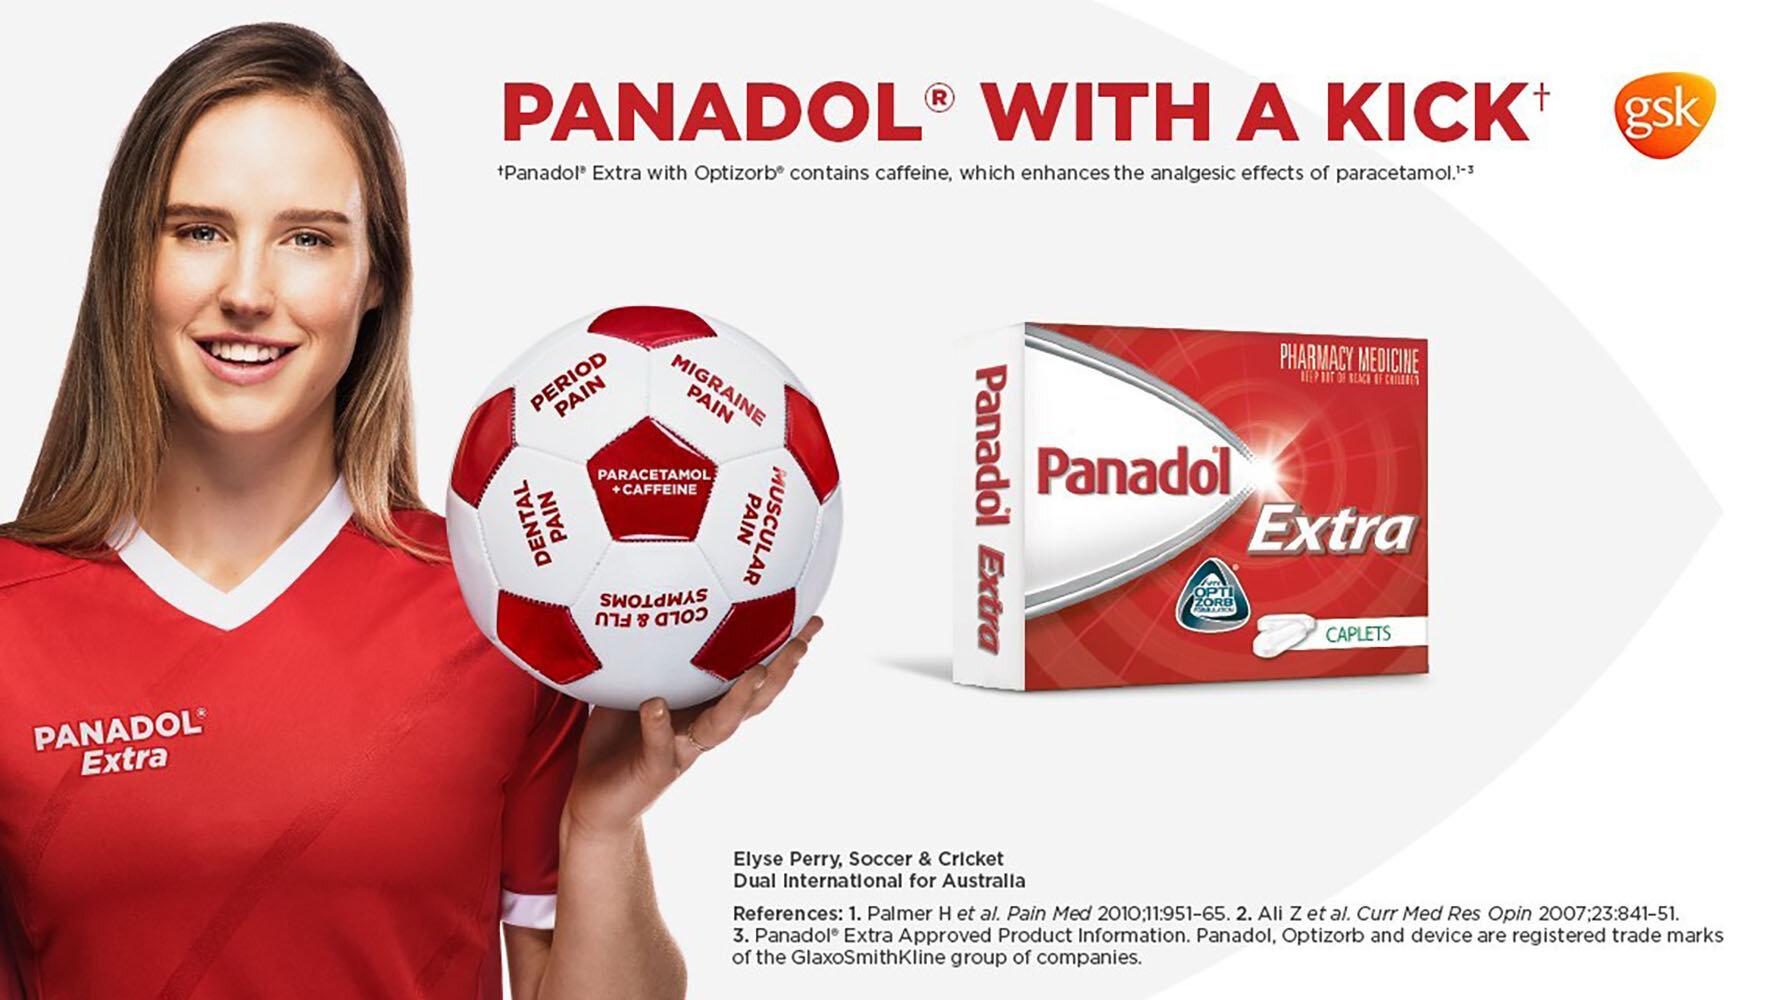 GSK1614_PanadolExtra_Sponsored-Post-and-Banner_v1a21.jpg